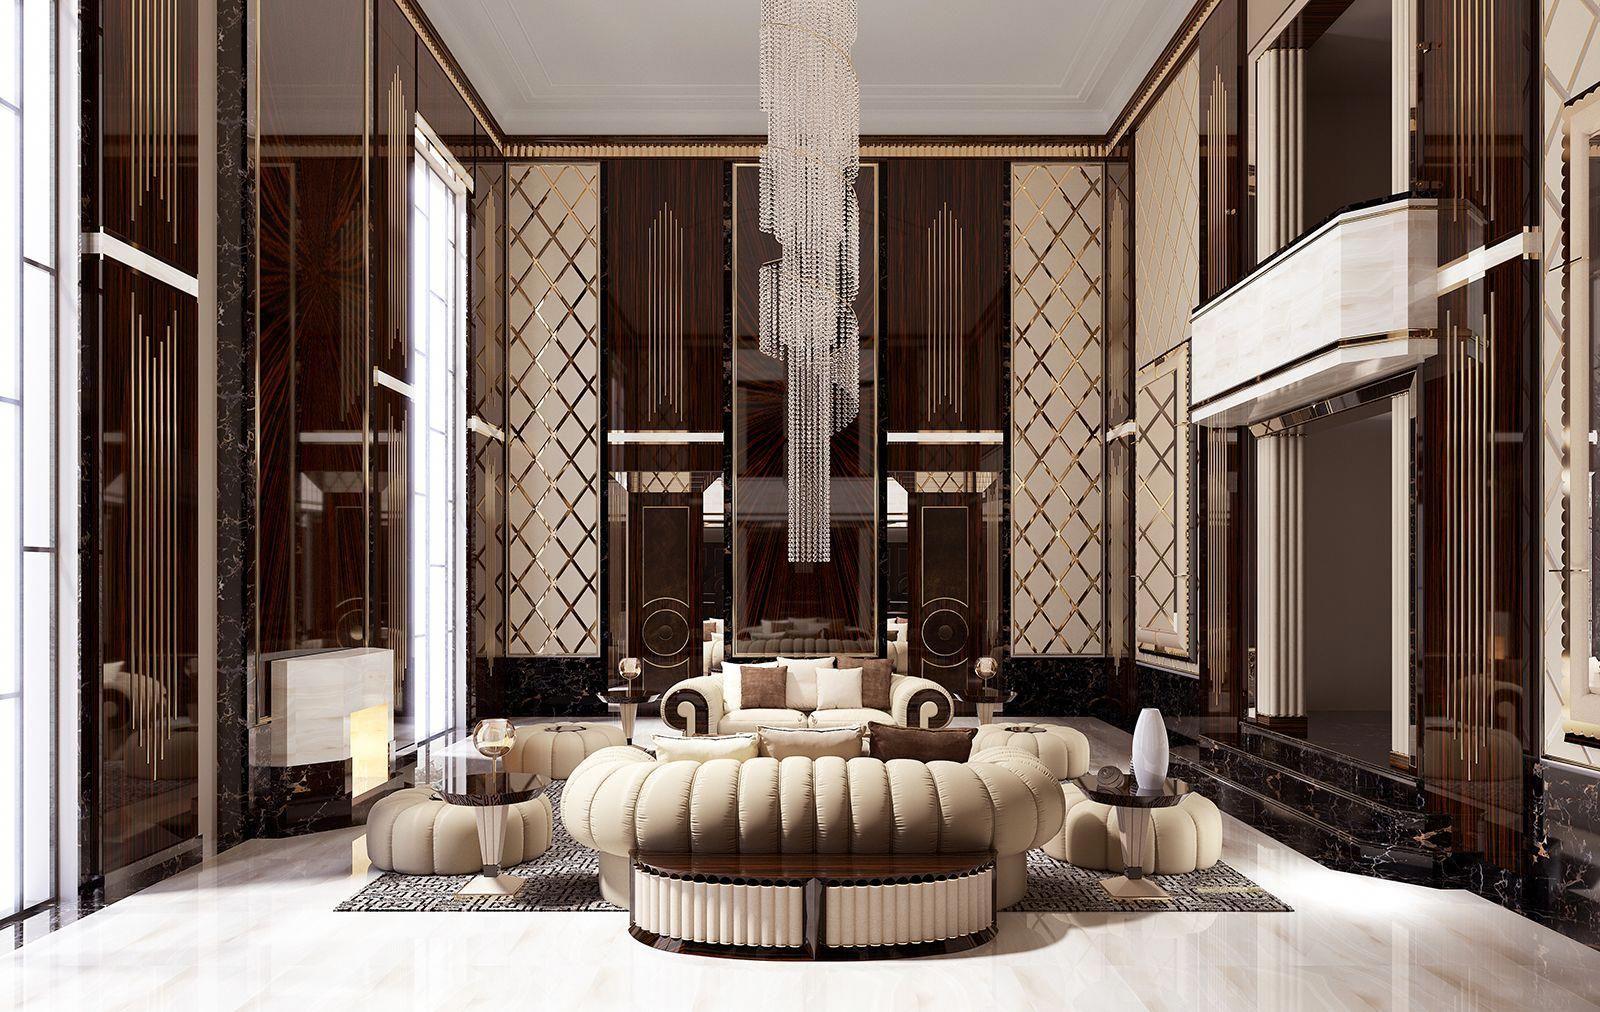 Orion Collection Www Turri It Luxury Italian Living Room Furniture Luxurylivingro Living Room Decor Modern Italian Living Room Contemporary Living Room Design